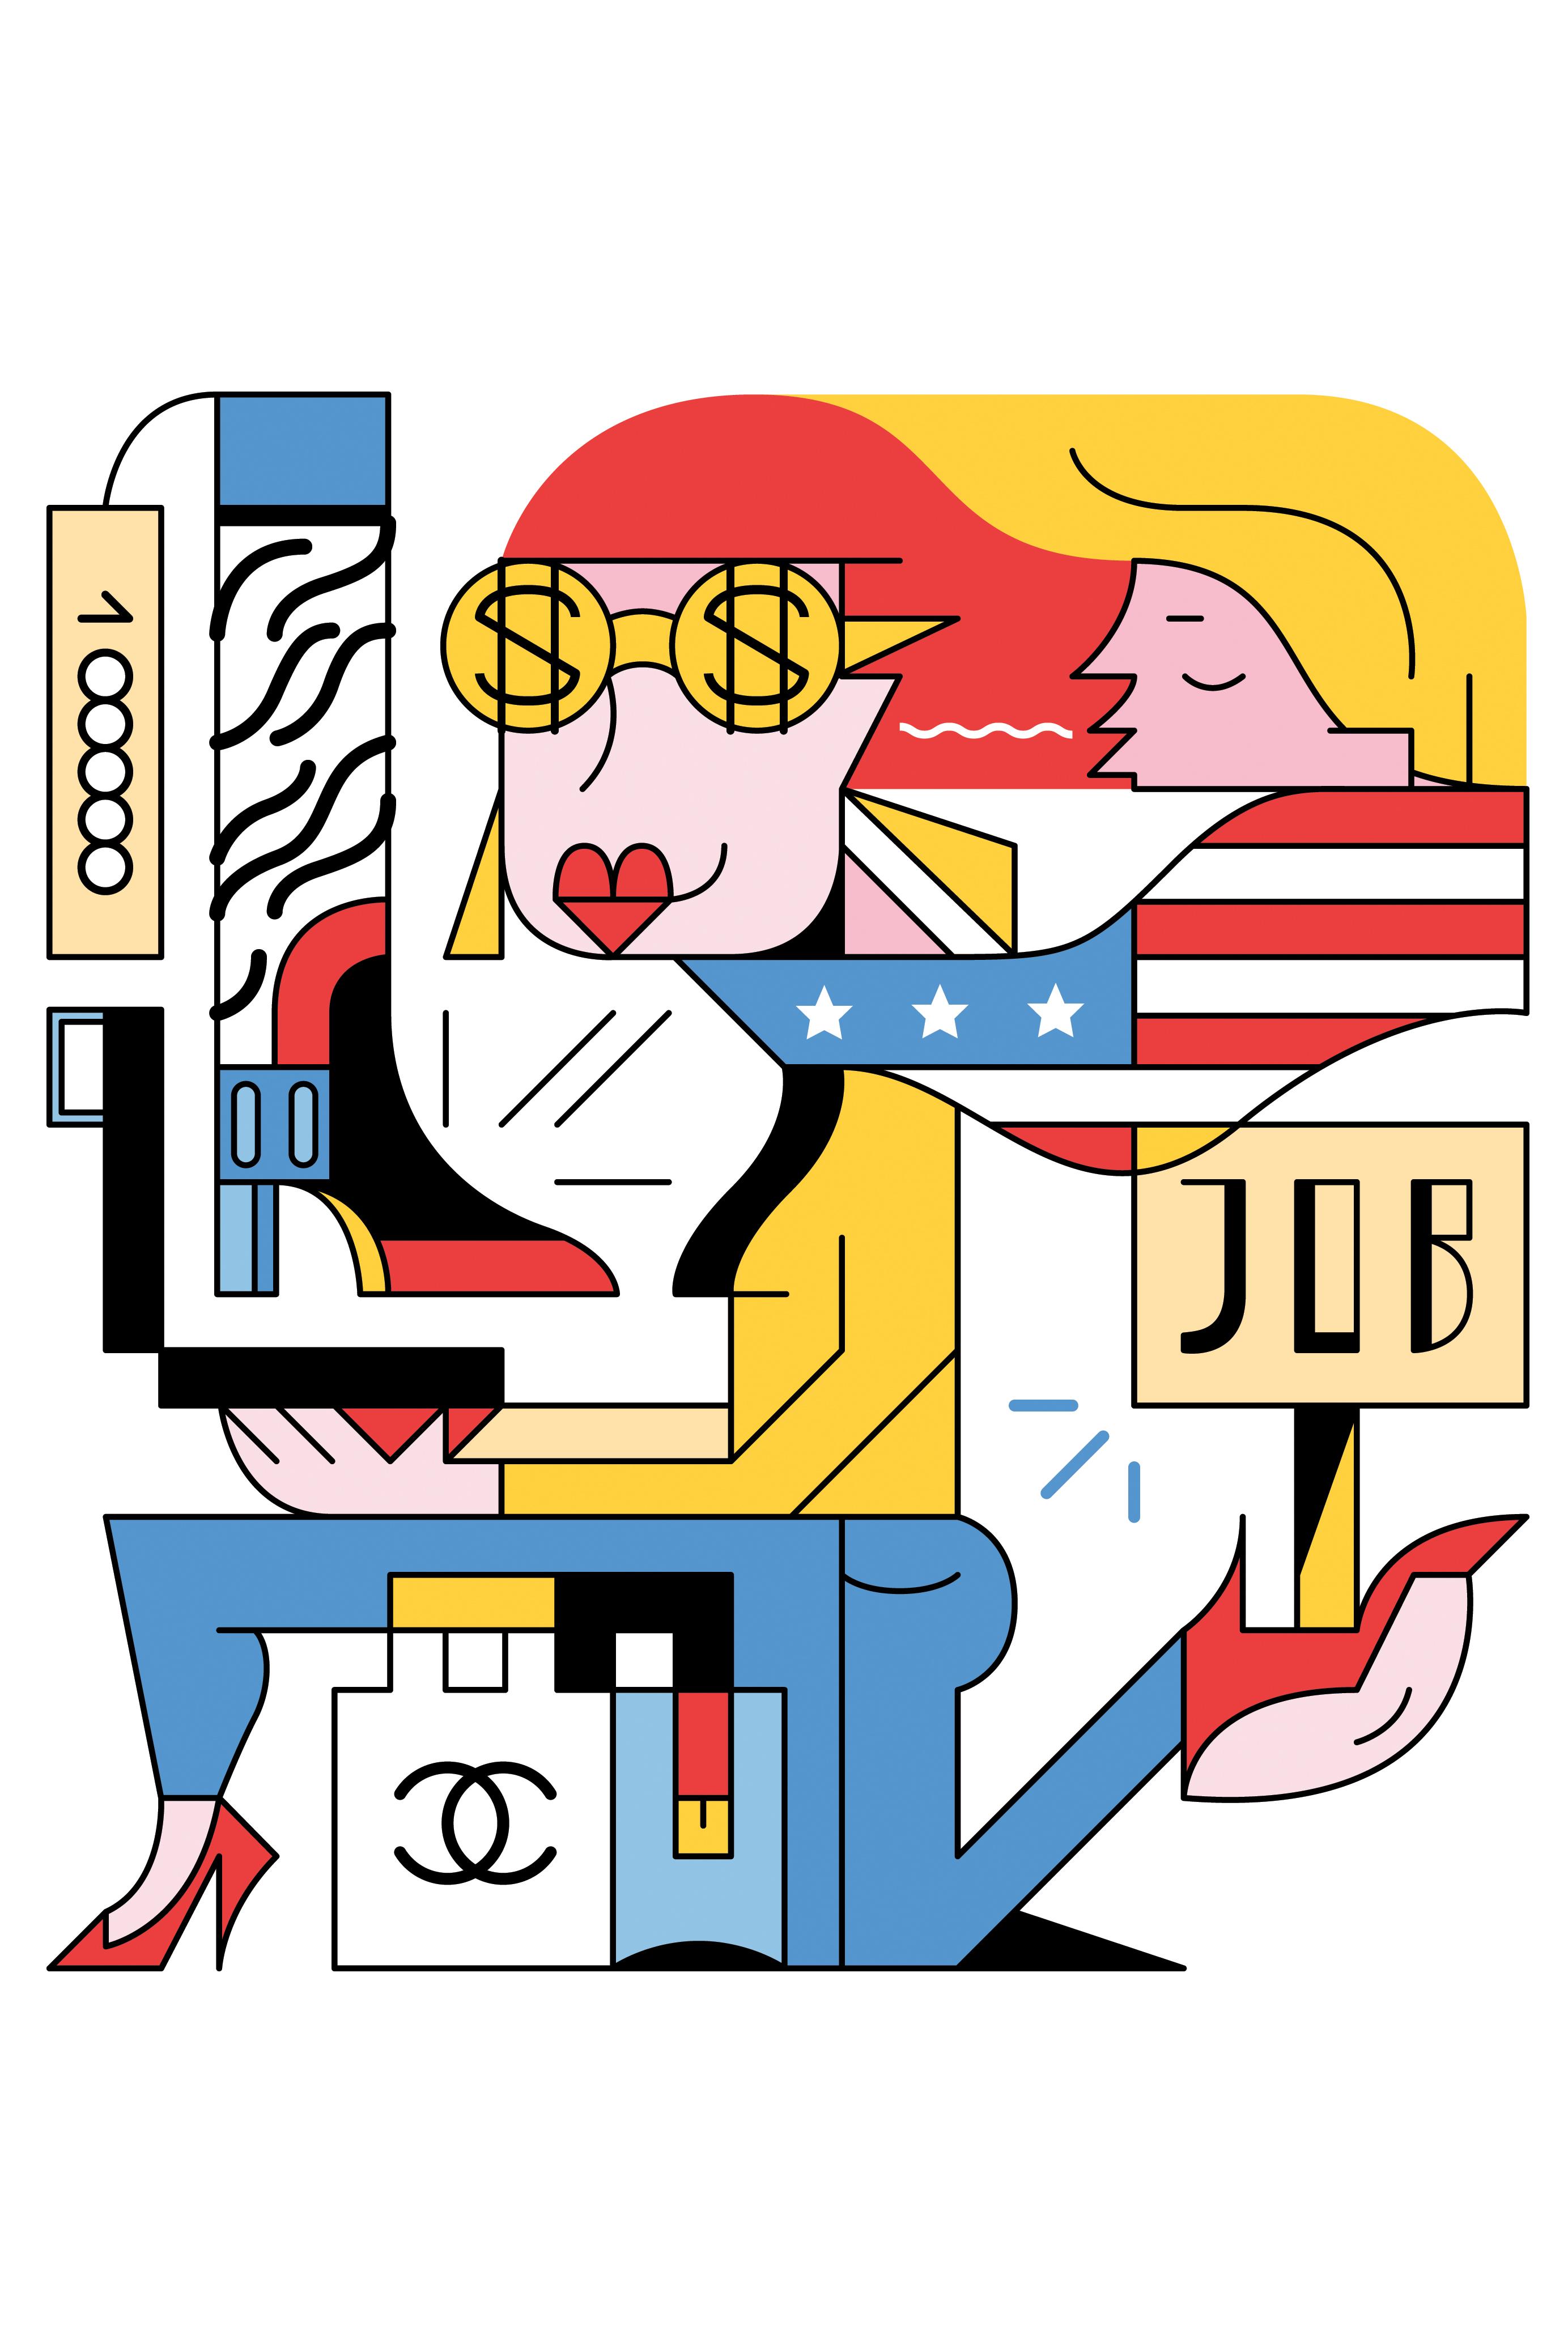 U.S. Economy Seen as Fundamentally OK.